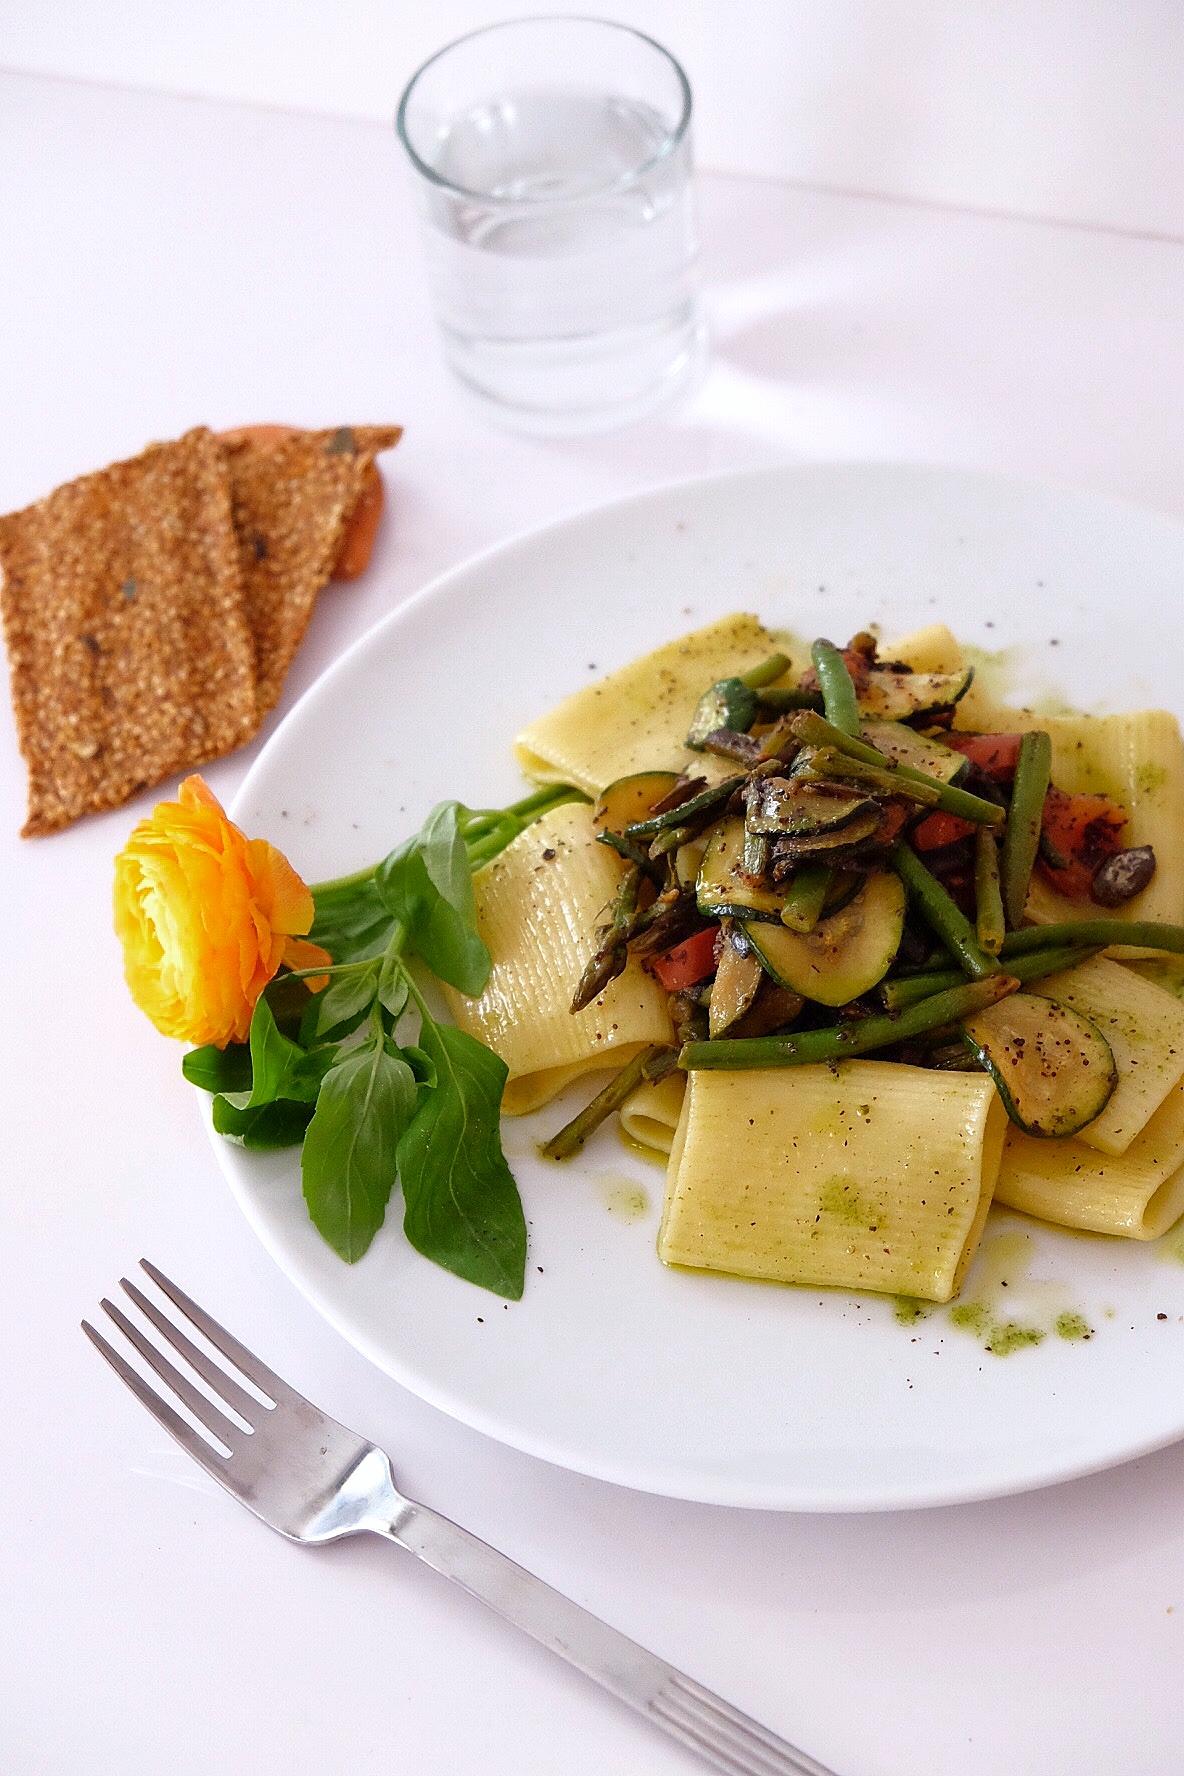 Pasta with homemade green pesto and seasonal vegetables